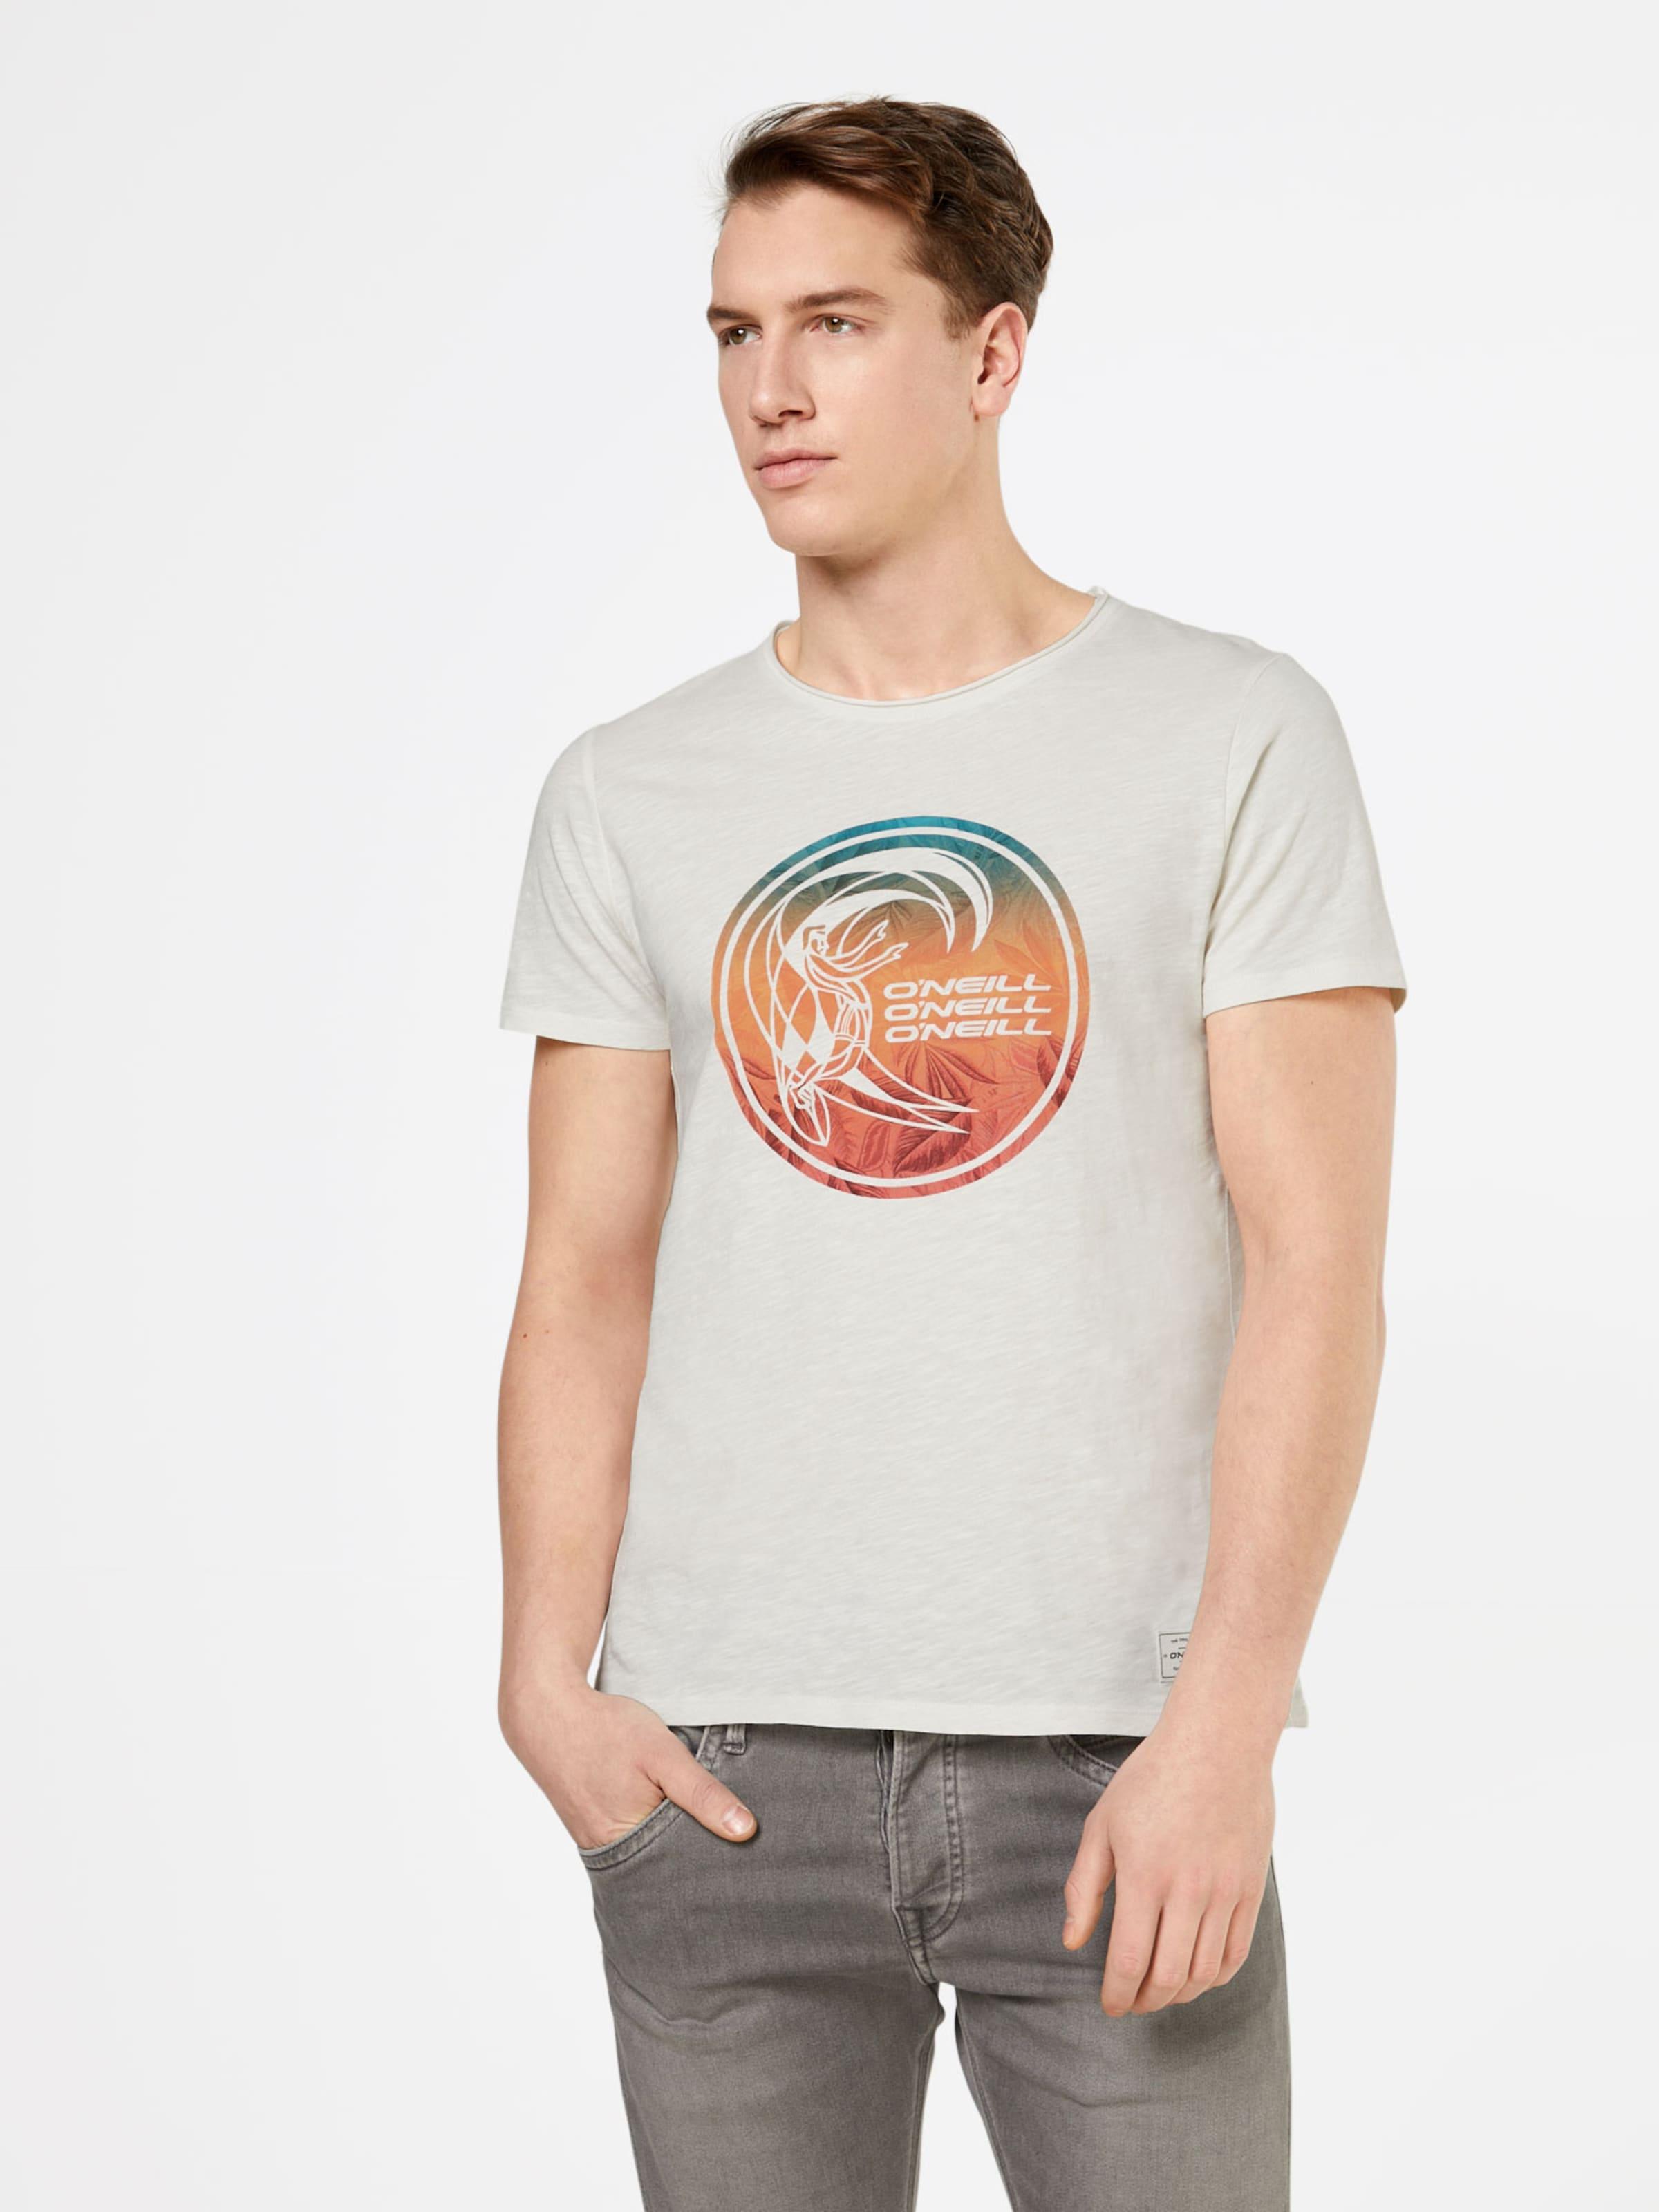 O'NEILL Tshirt 'Circle Surfer' Online Günstig Online 9fvdEaePb7